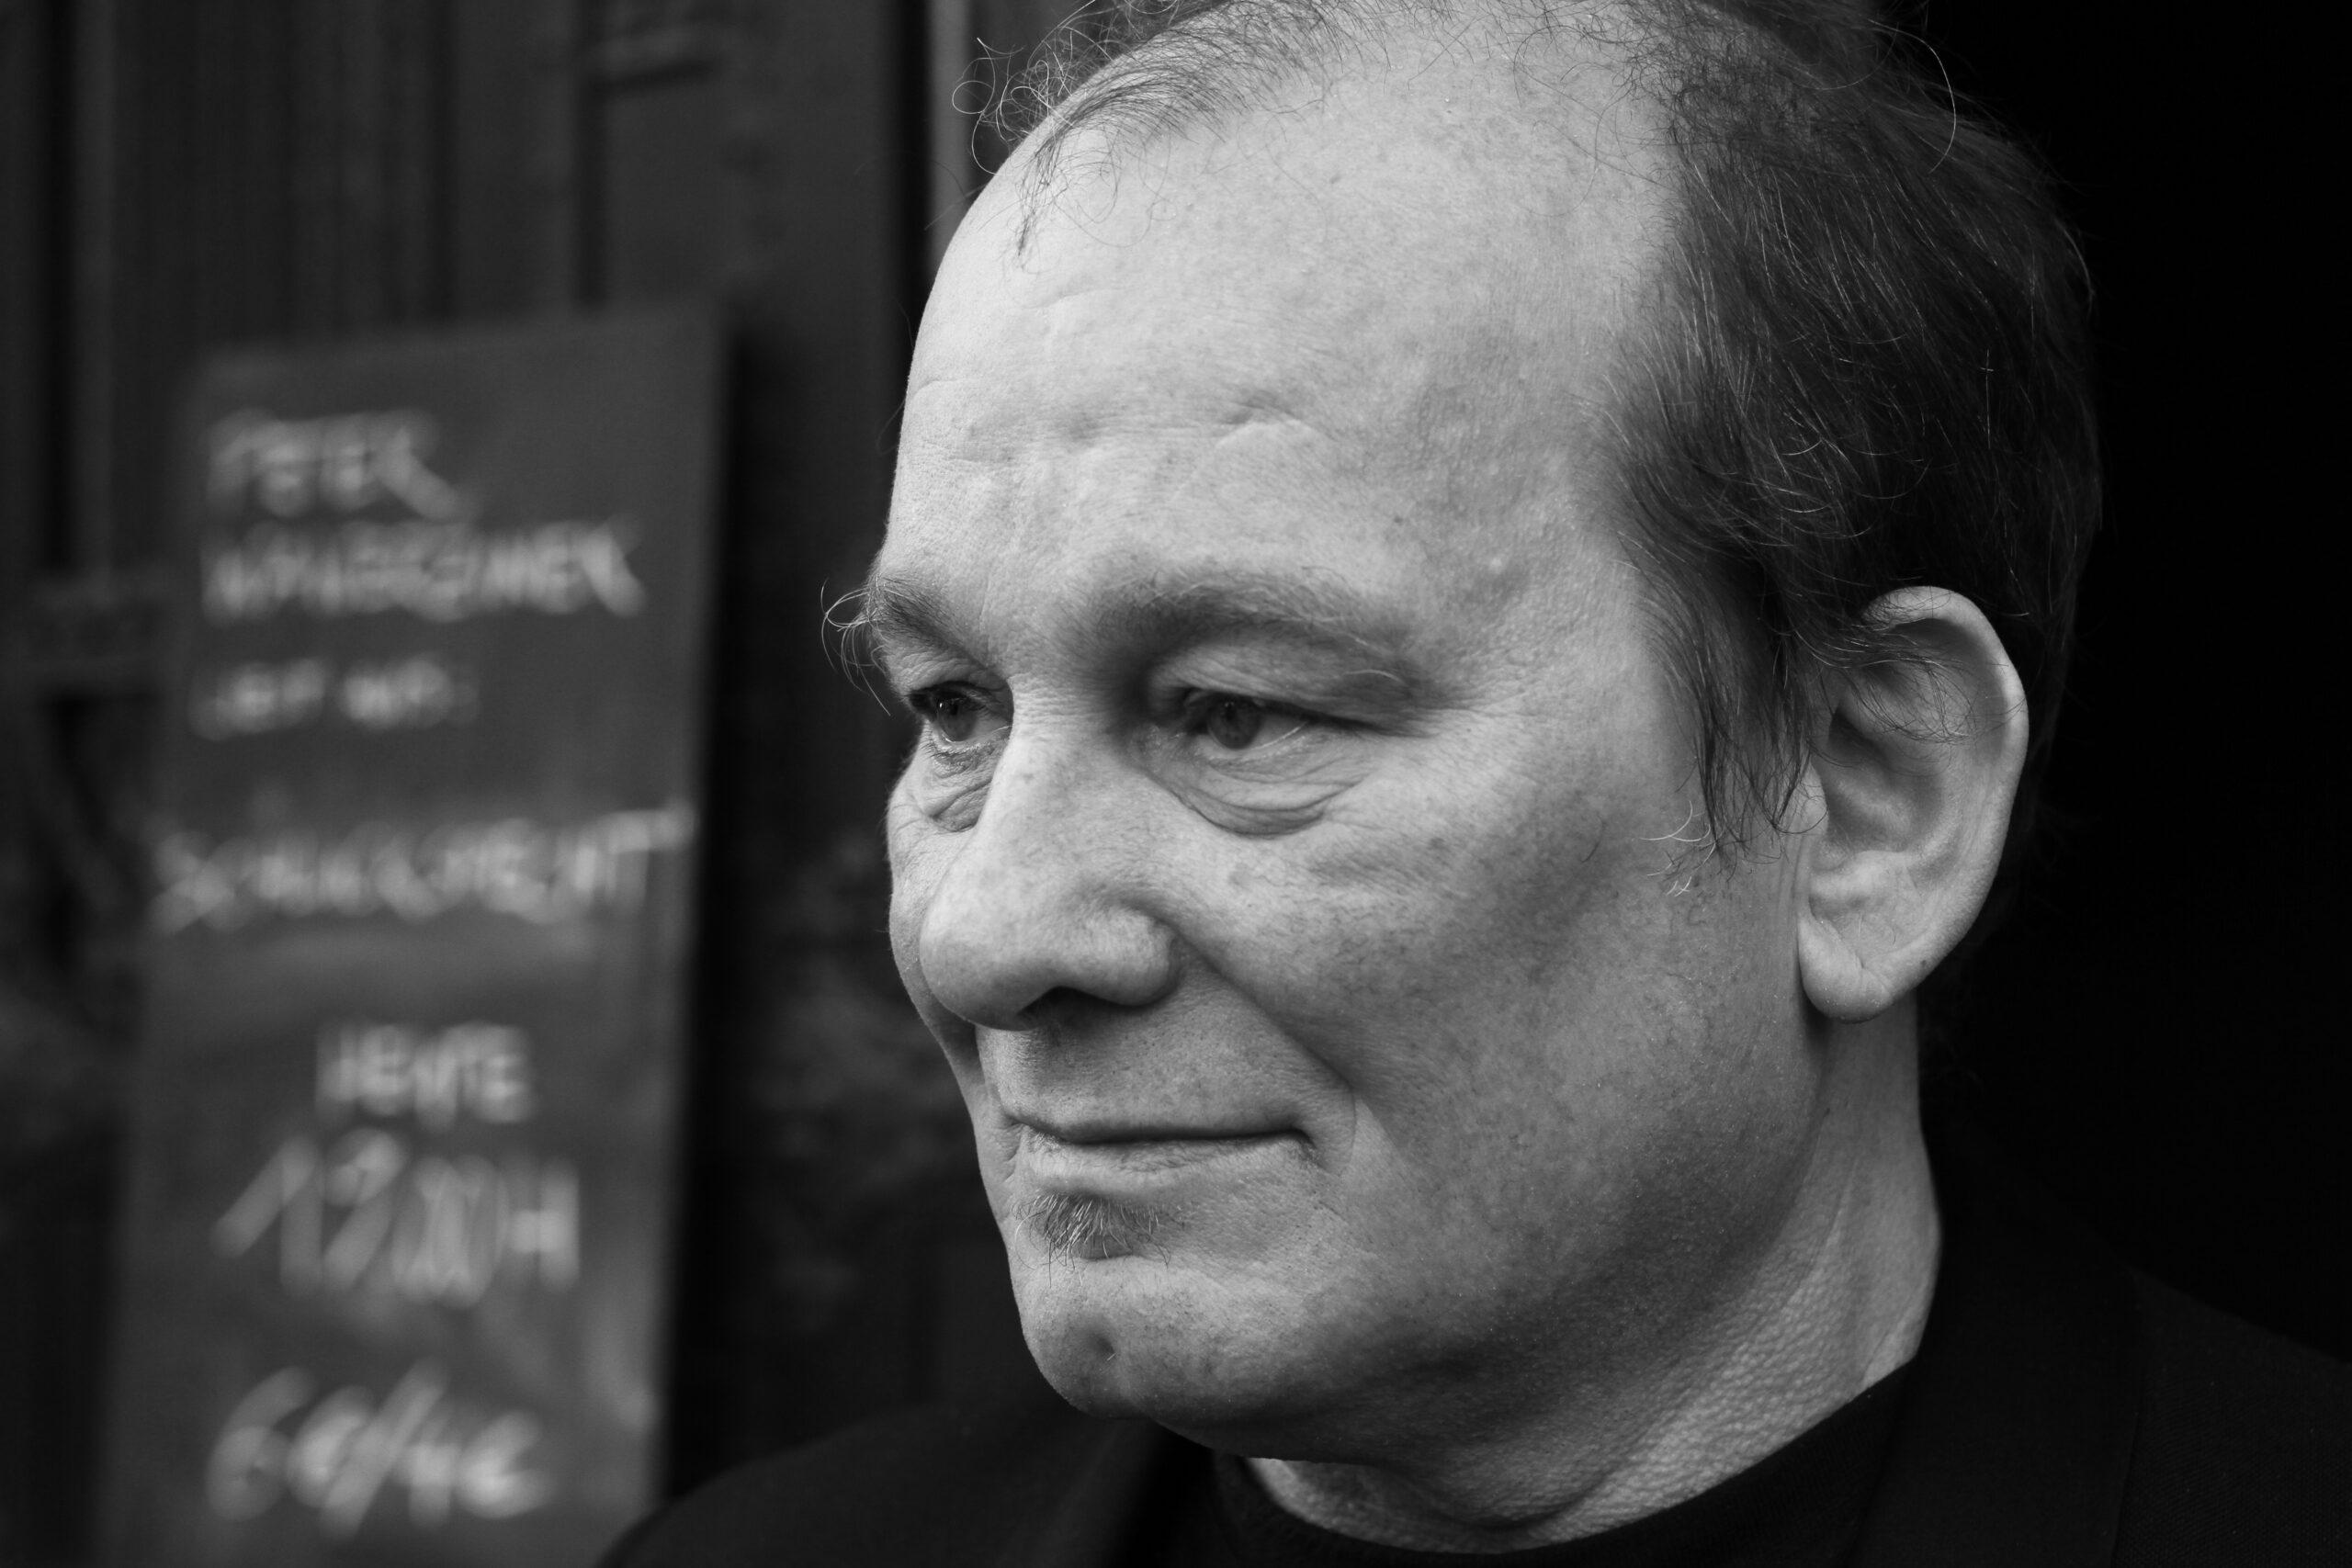 Peter Wawerzinek | STATT lesen : STADT schreiben